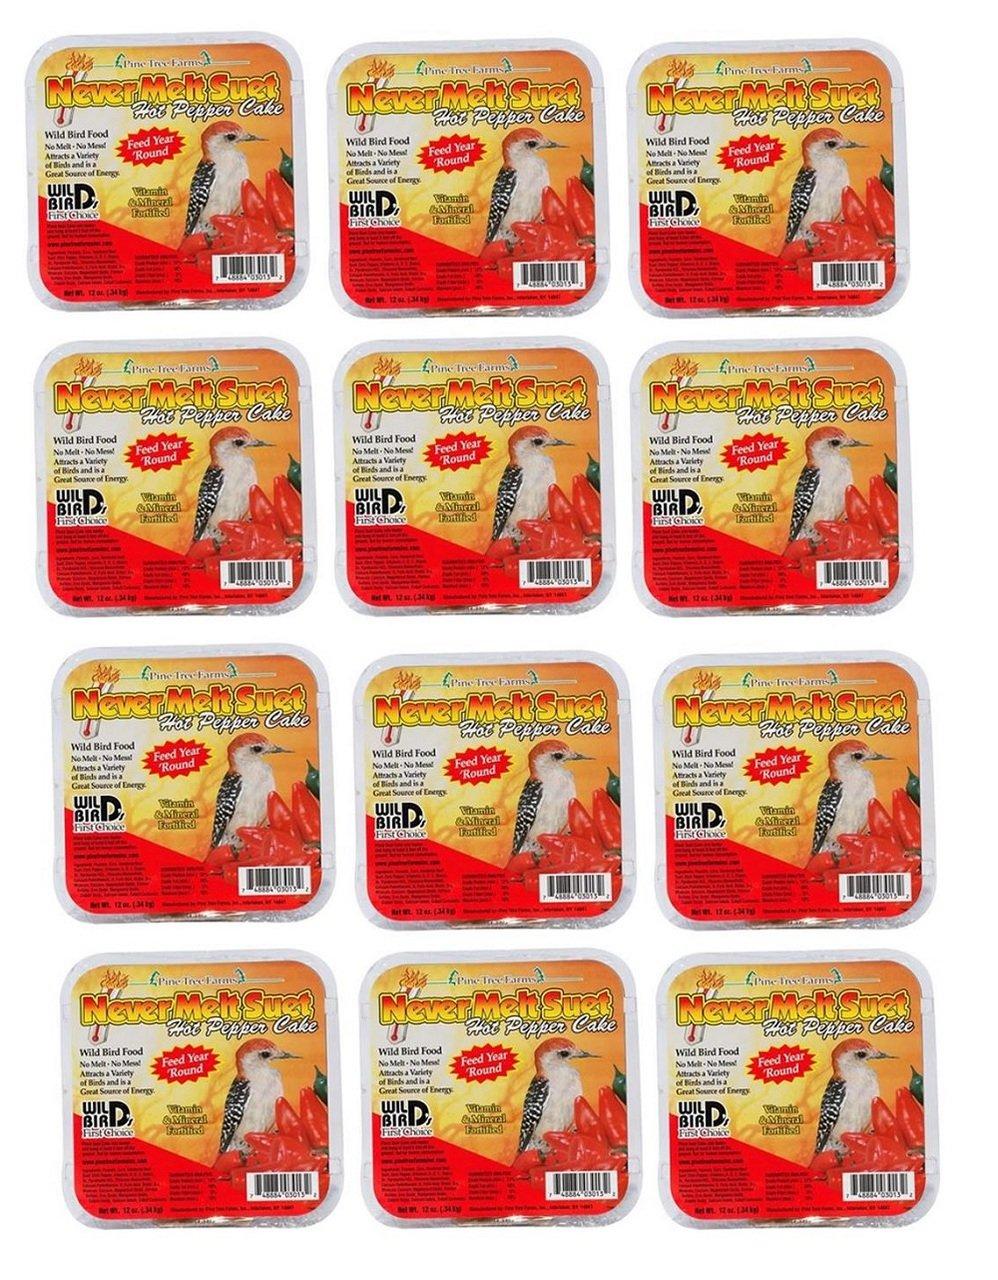 Pine Tree Farms 3013 Hot Pepper Never Melt Suet Dough, 12 Ounce, 12 Pack by Pine Tree Farms